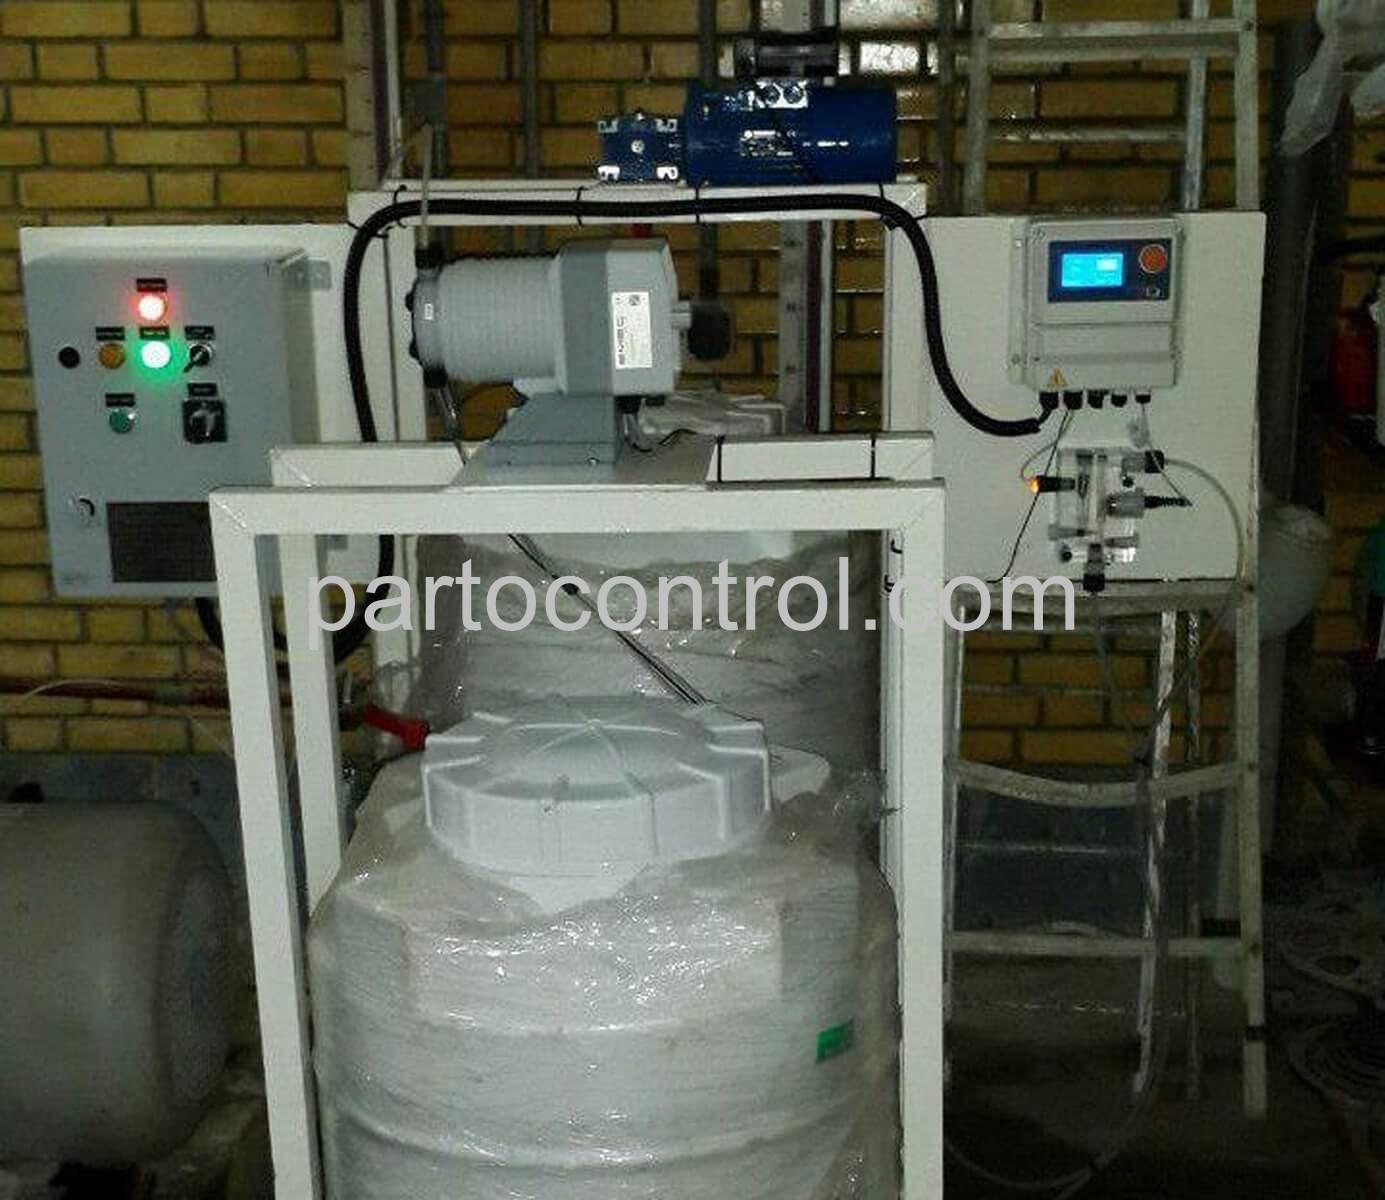 Liquid chlorin of the Abadan Ports Authorityکلرزن مایع سازمان بنادر آبادان 2 - پروژه کلرزن مایع